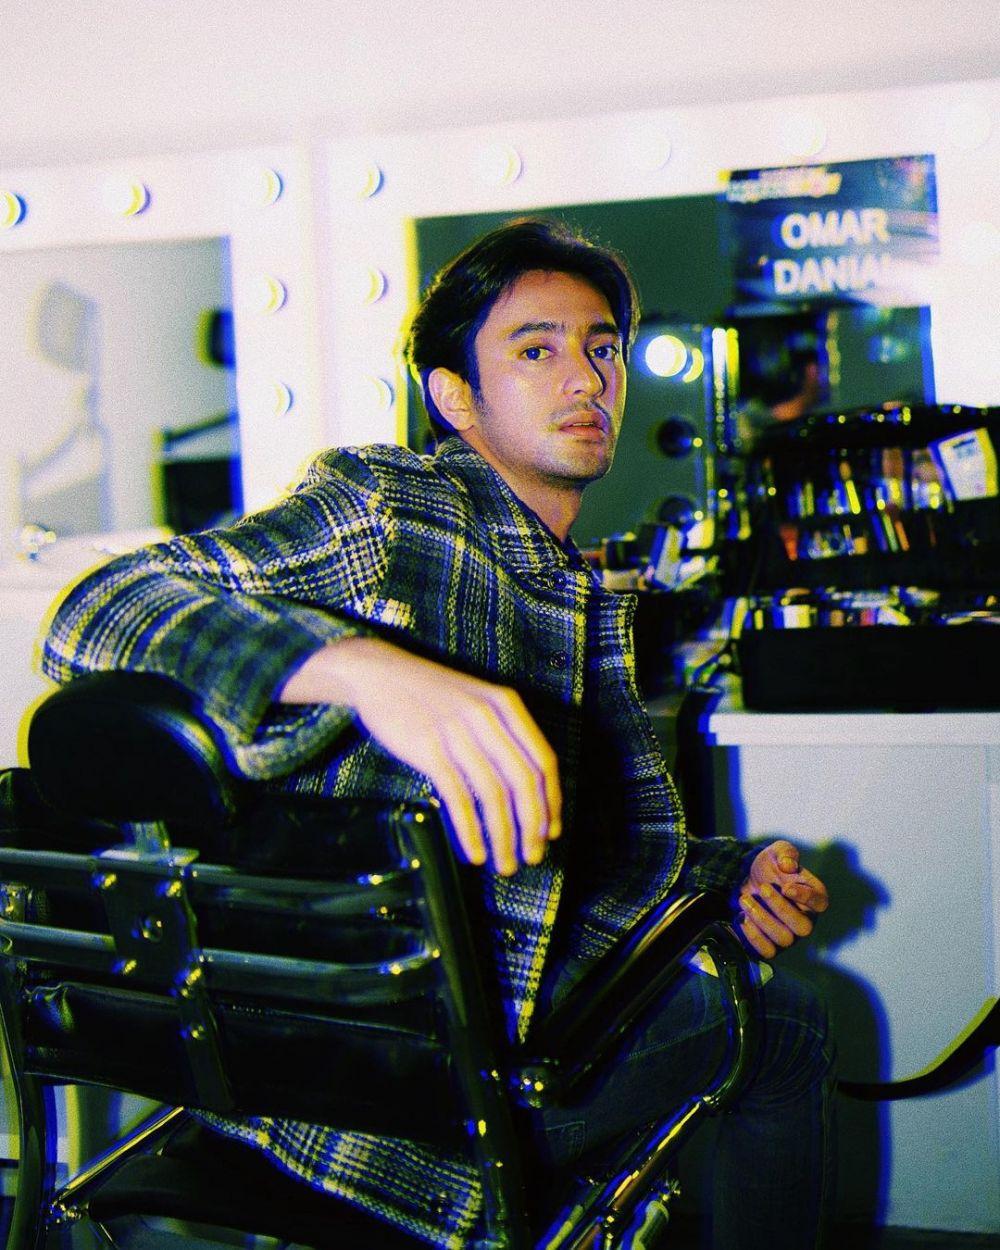 Omar Daniel dengan rambut baru © 2021 brilio.net